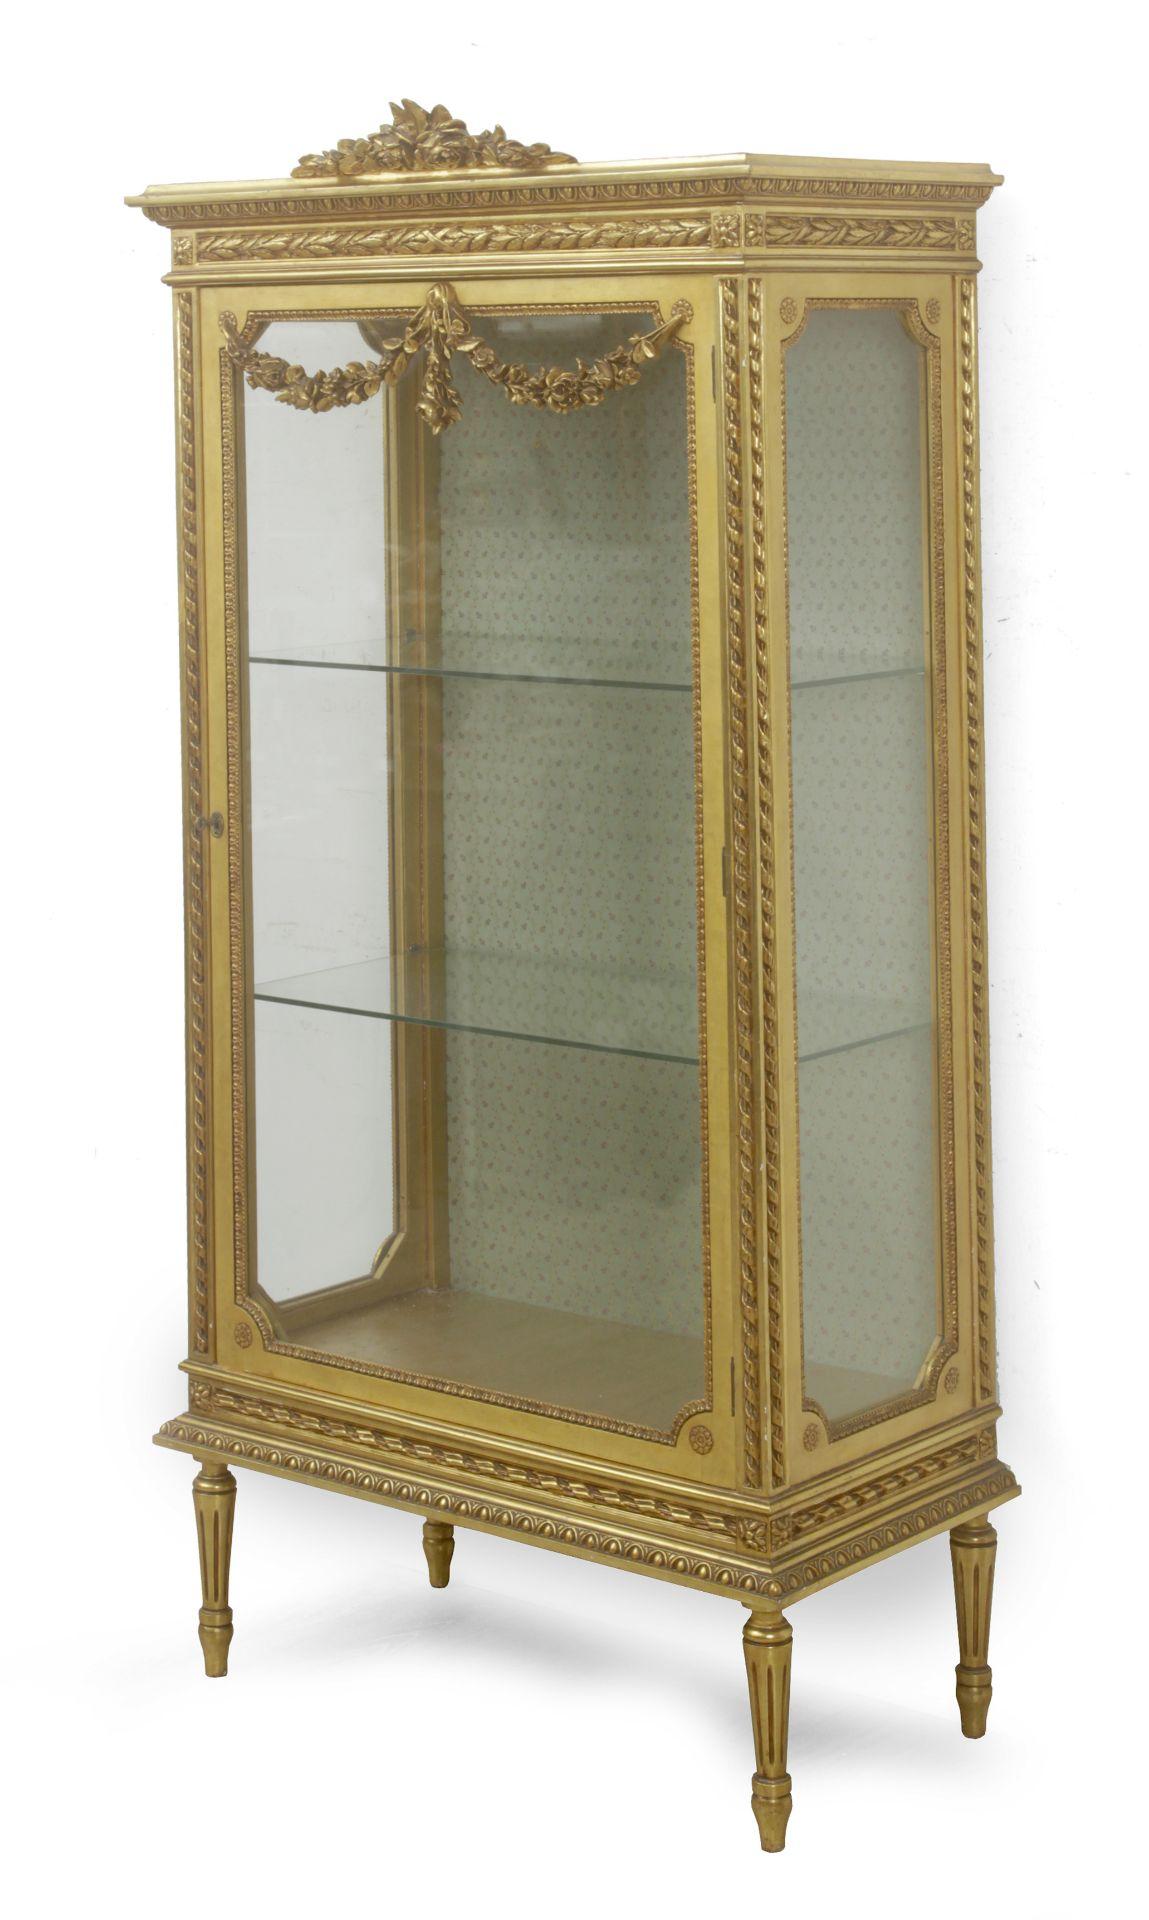 A 20th century Louis XVI style glass cabinet - Bild 2 aus 3